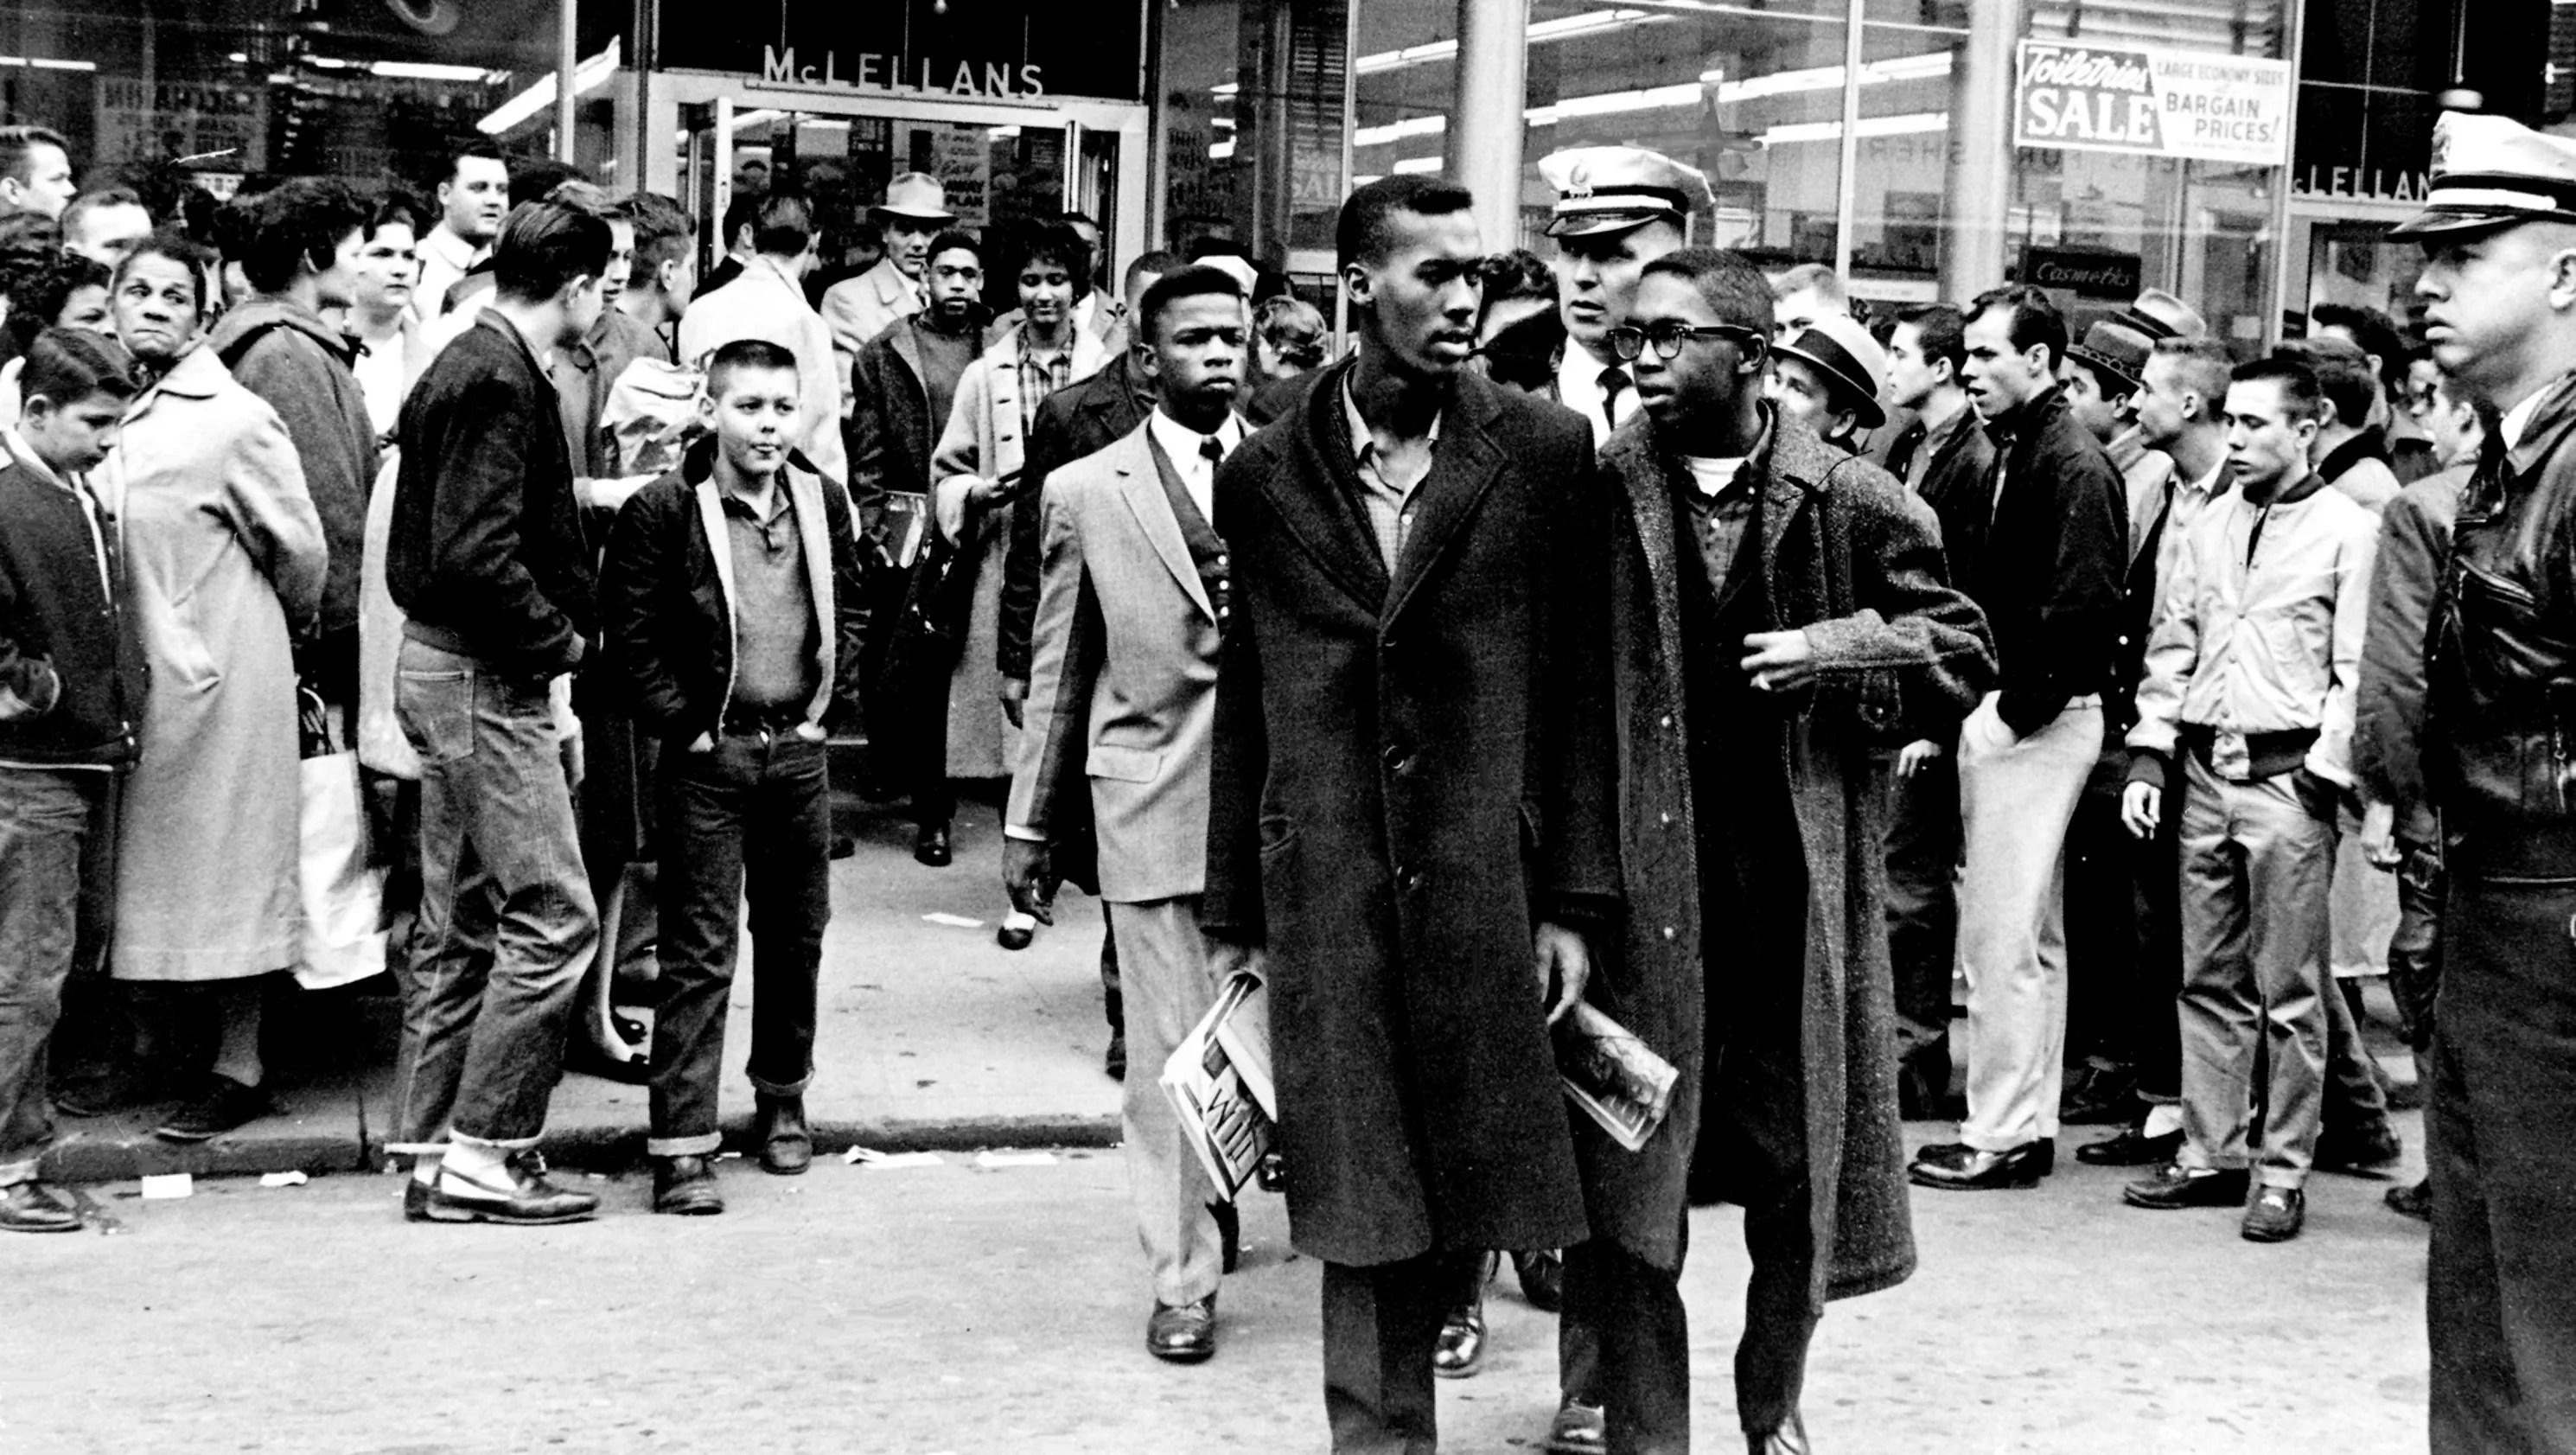 Nashville Then Civil Rights Leader John Lewis From